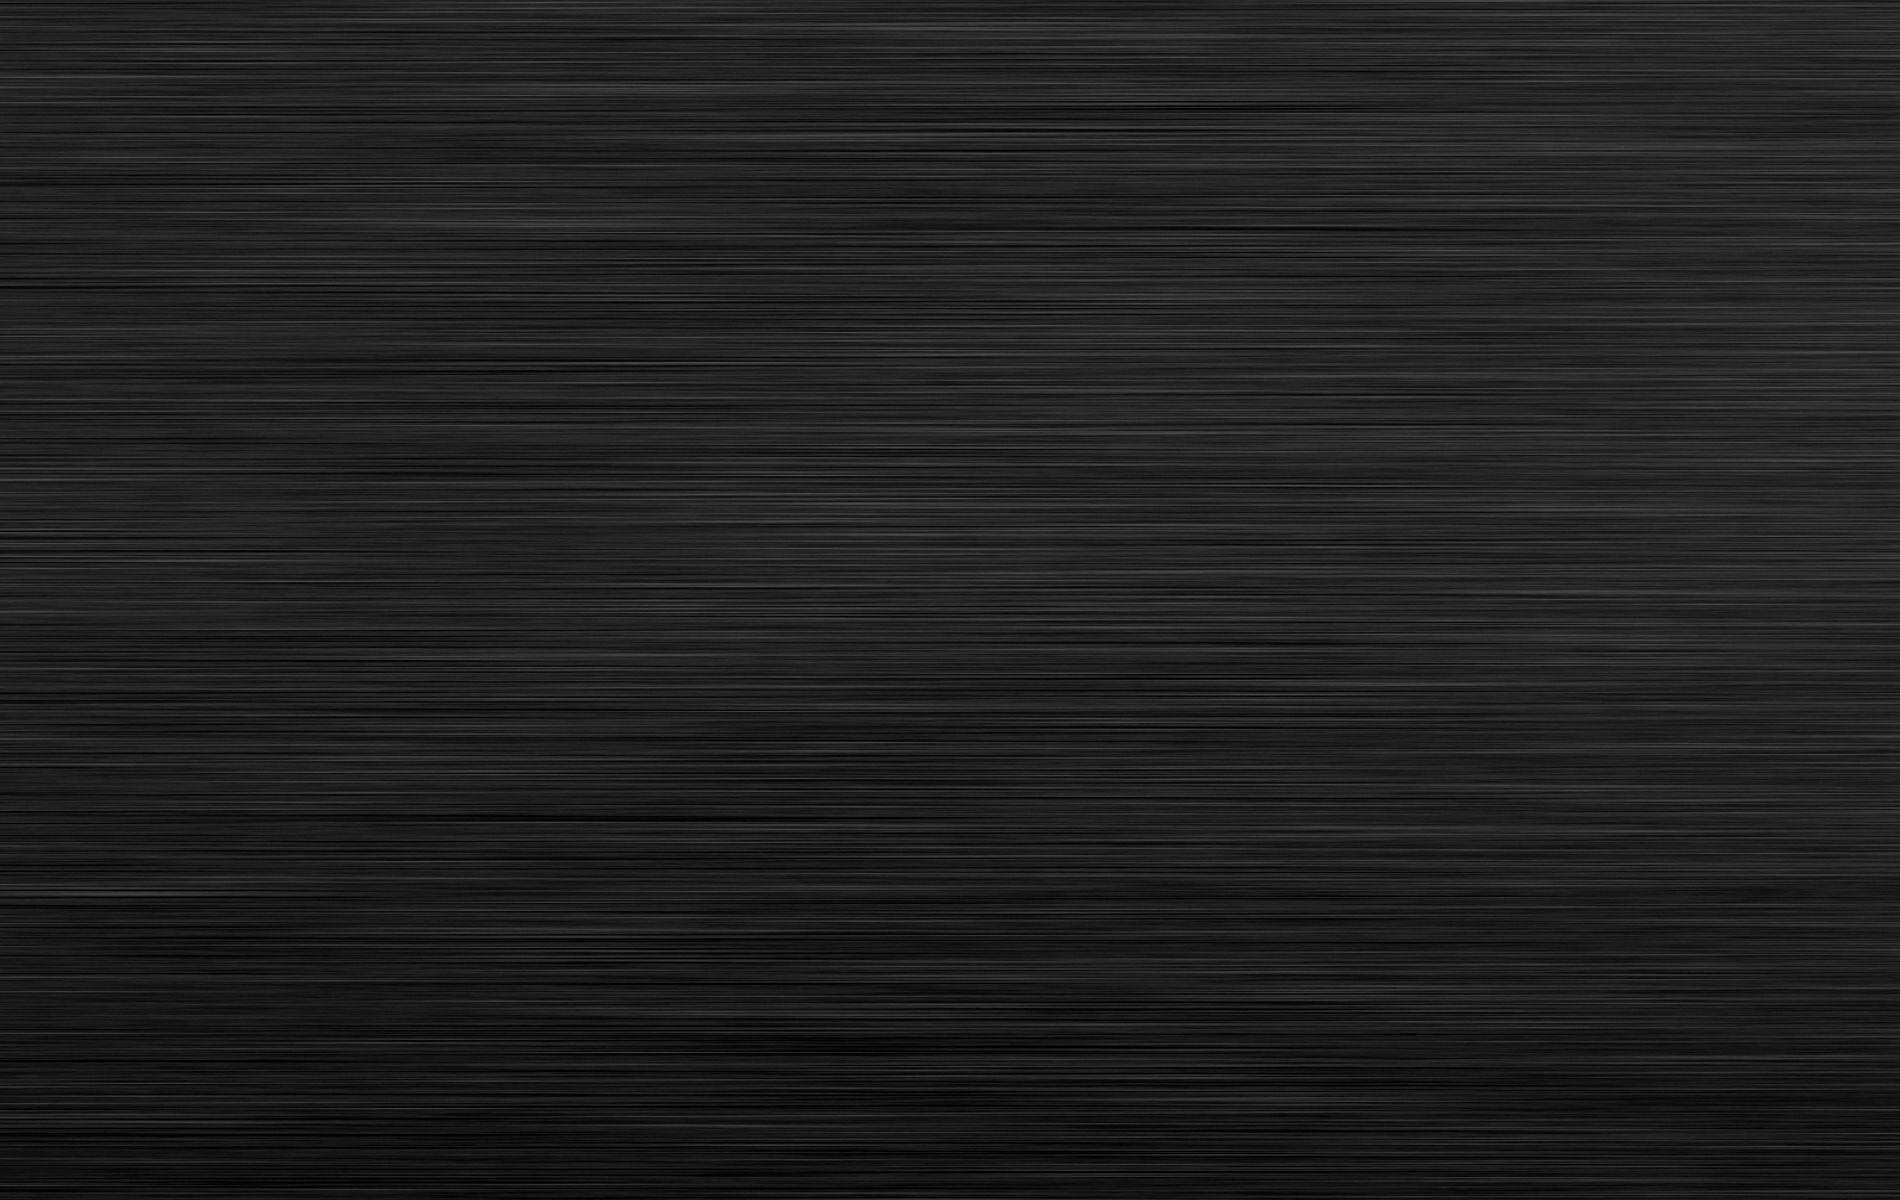 Black Wood Texture En Yeniler En Iyiler Black Wood Texture Wood Grain Wallpaper Wood Texture